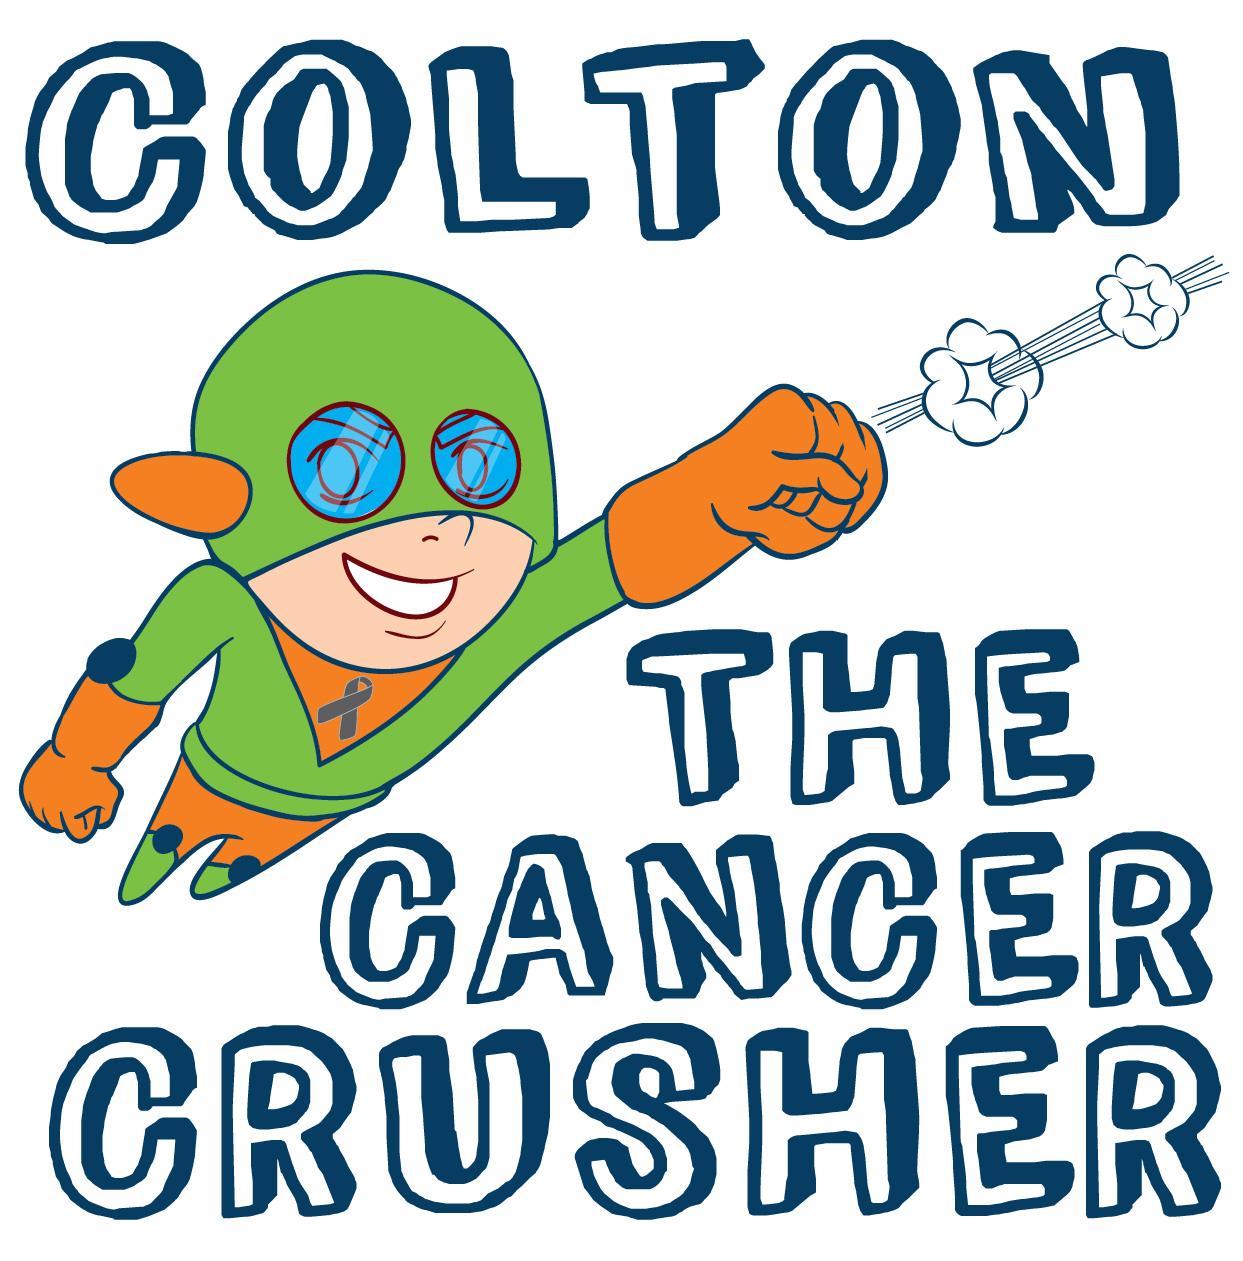 Custom Shirt to Fight Cancer